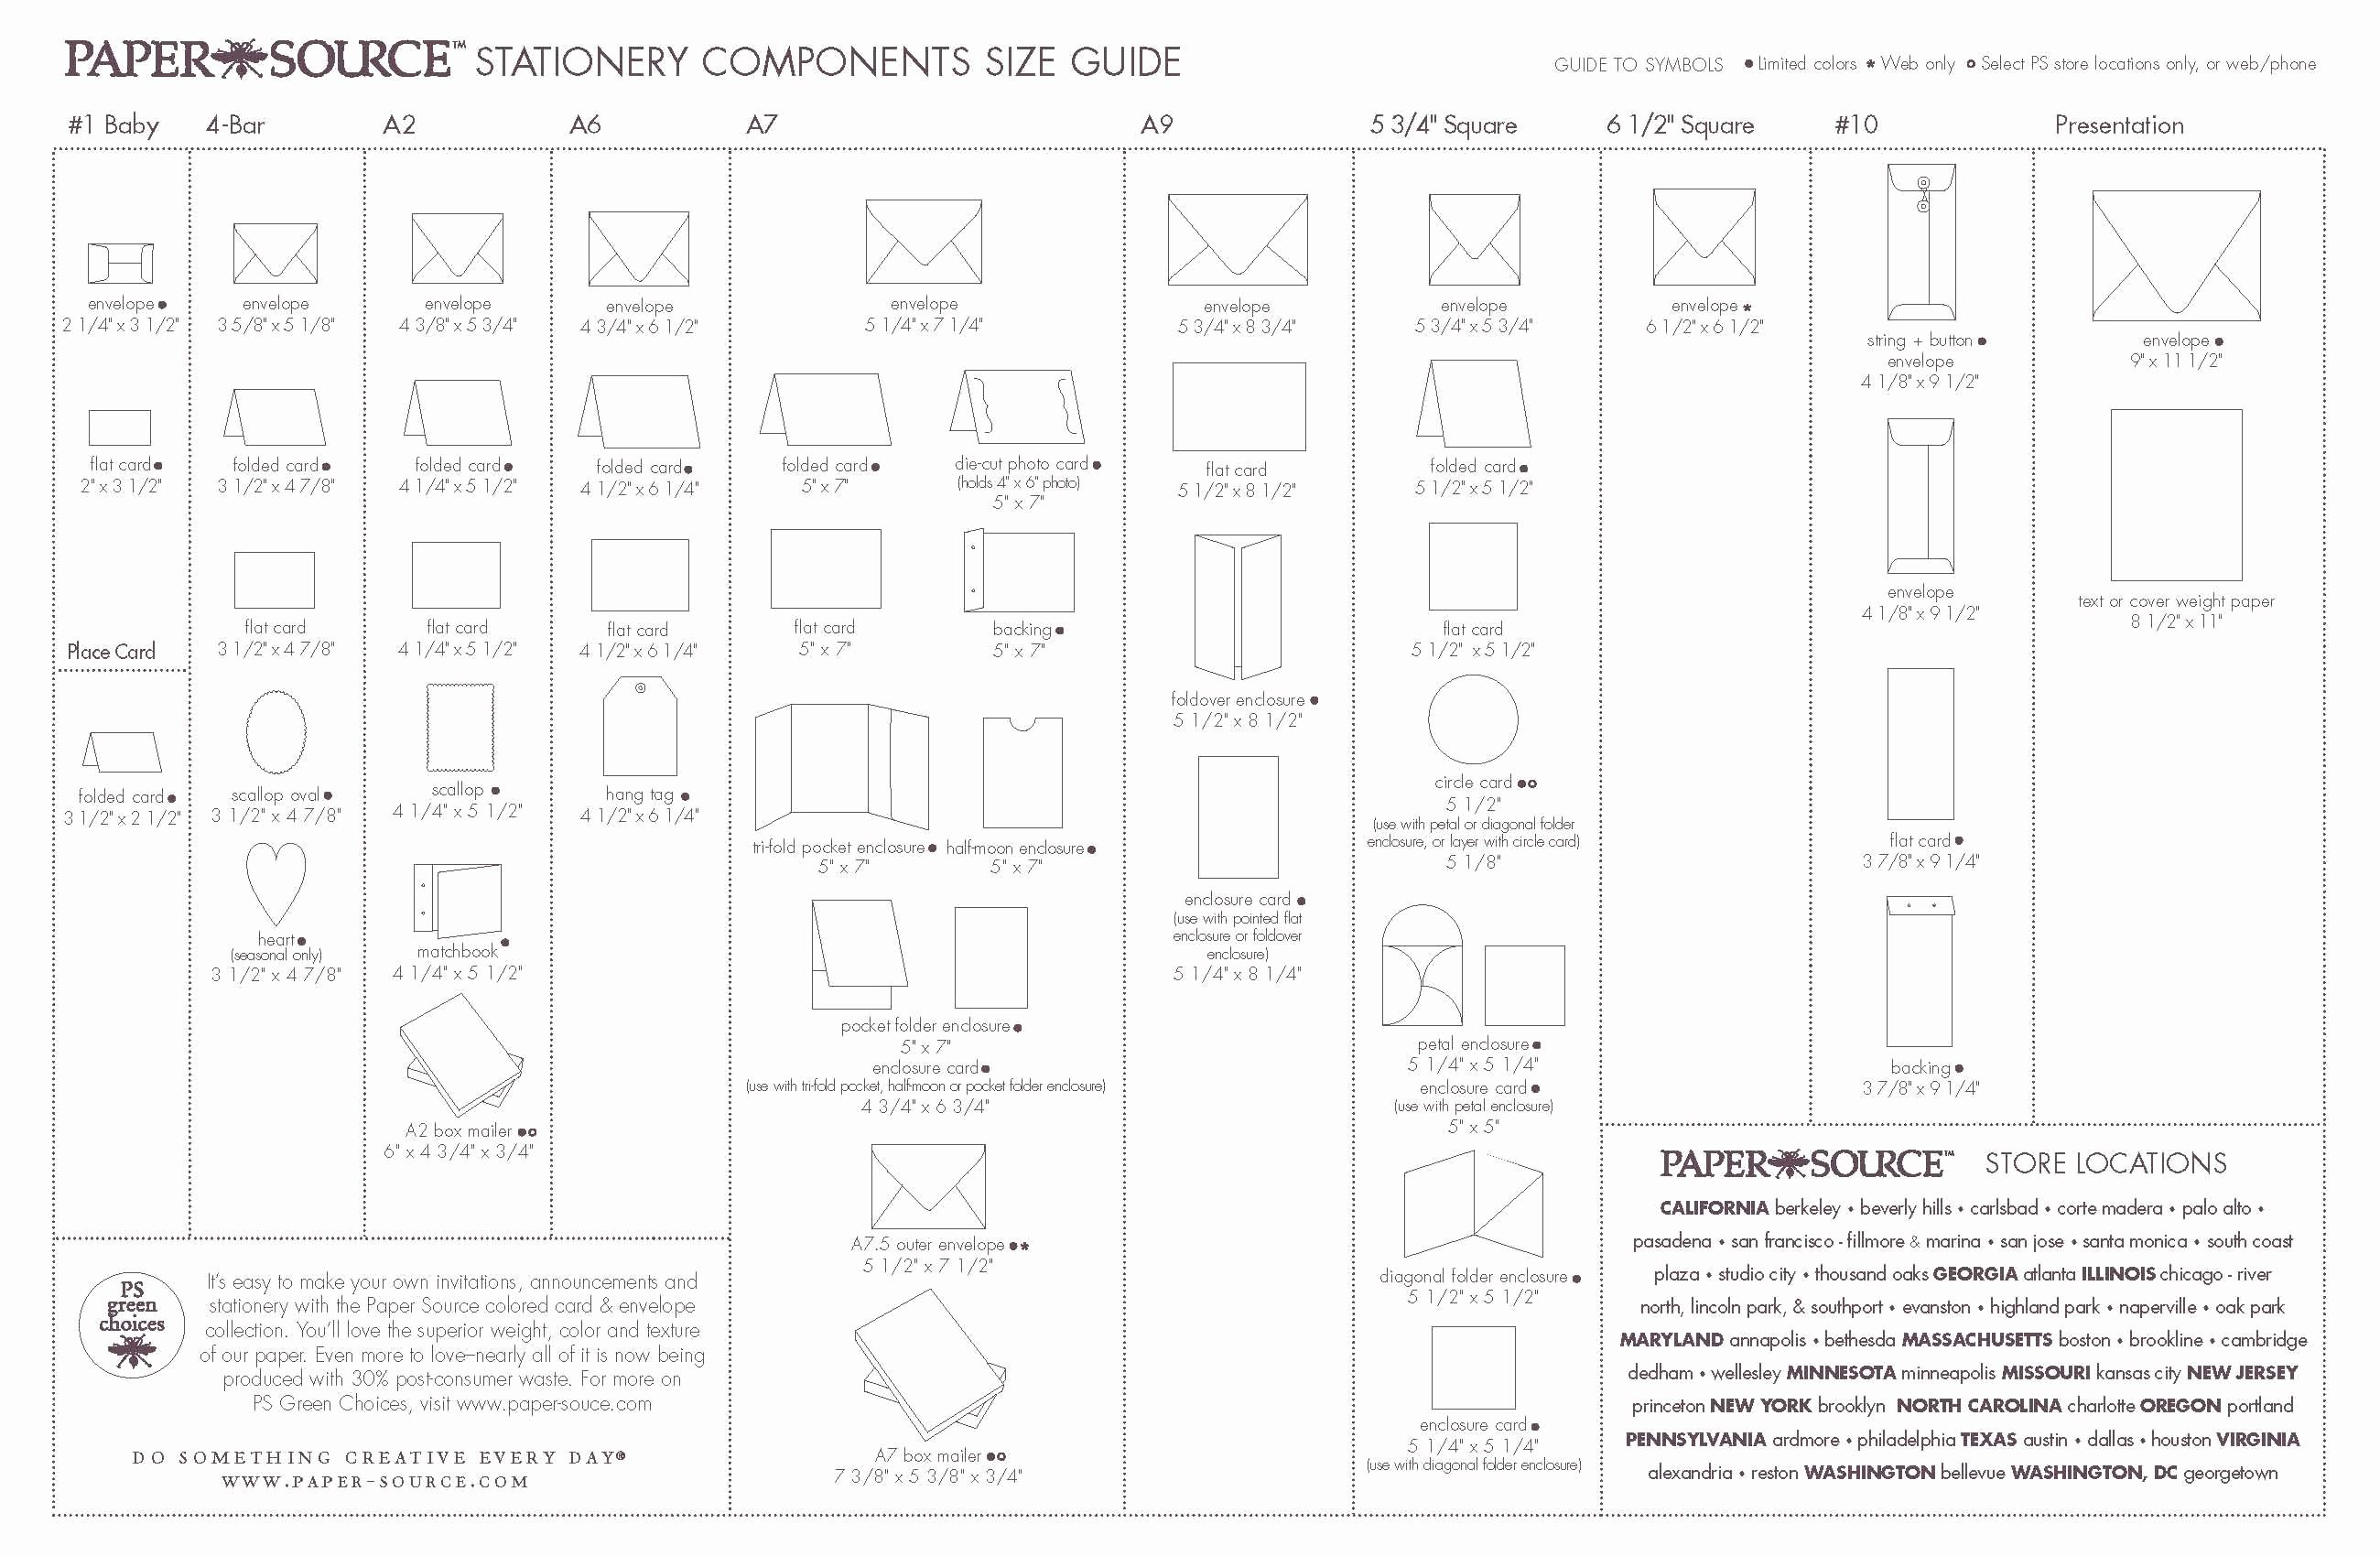 Invitation Envelope Sizes Chart Elegant Stationery Ponents Size Guide Envelope Card Size Chart